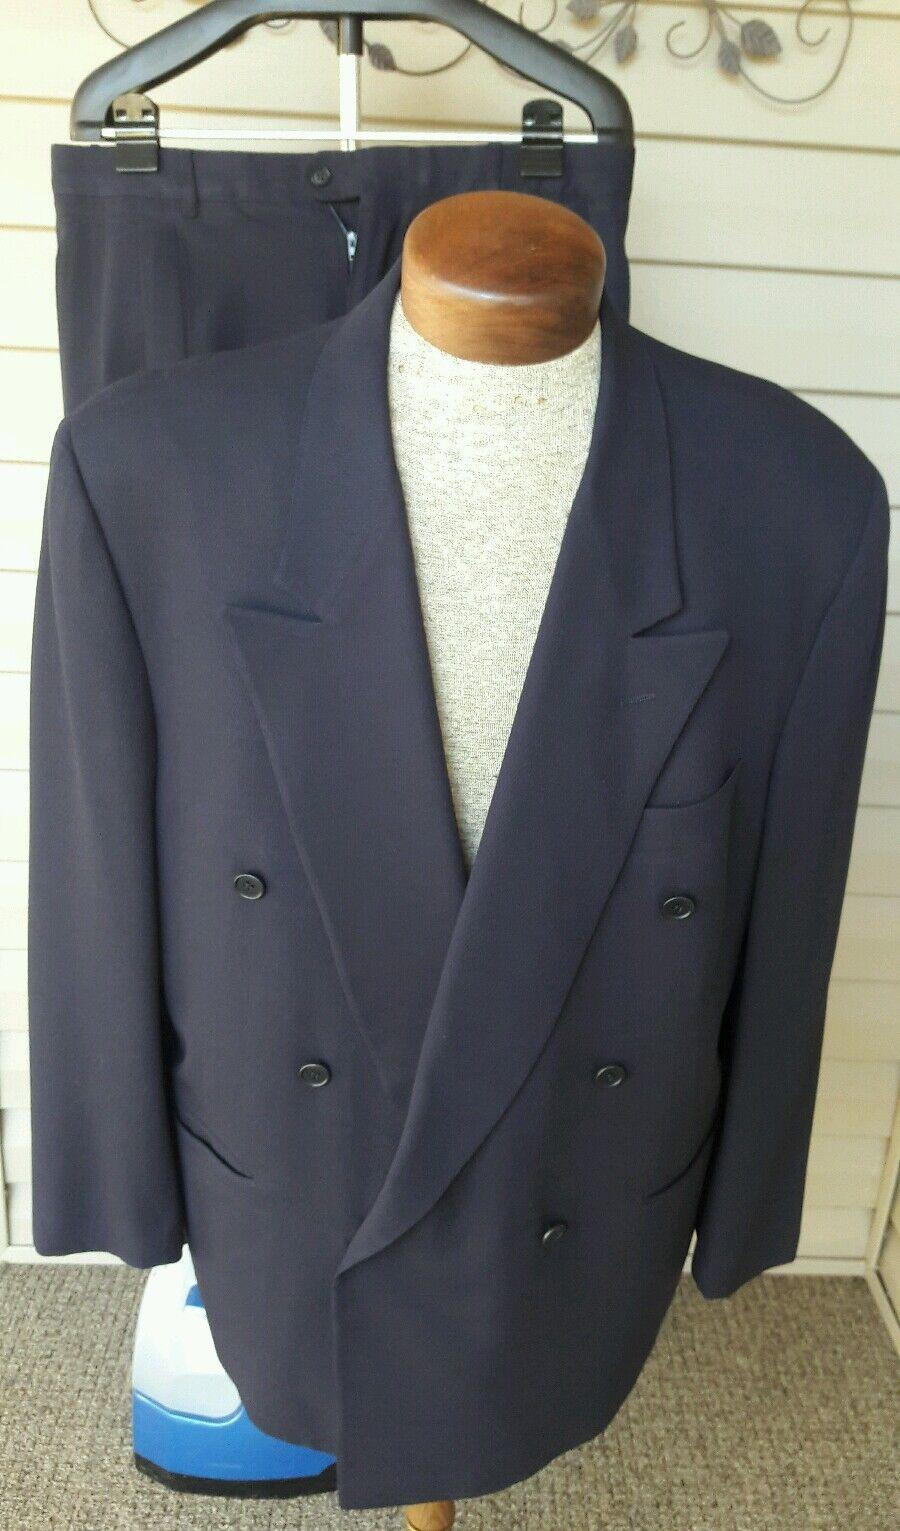 Pal Zileri Suit Double Breasted Blau Suit Peak Lapel EU 56 US 44 Reg Wool Nylon